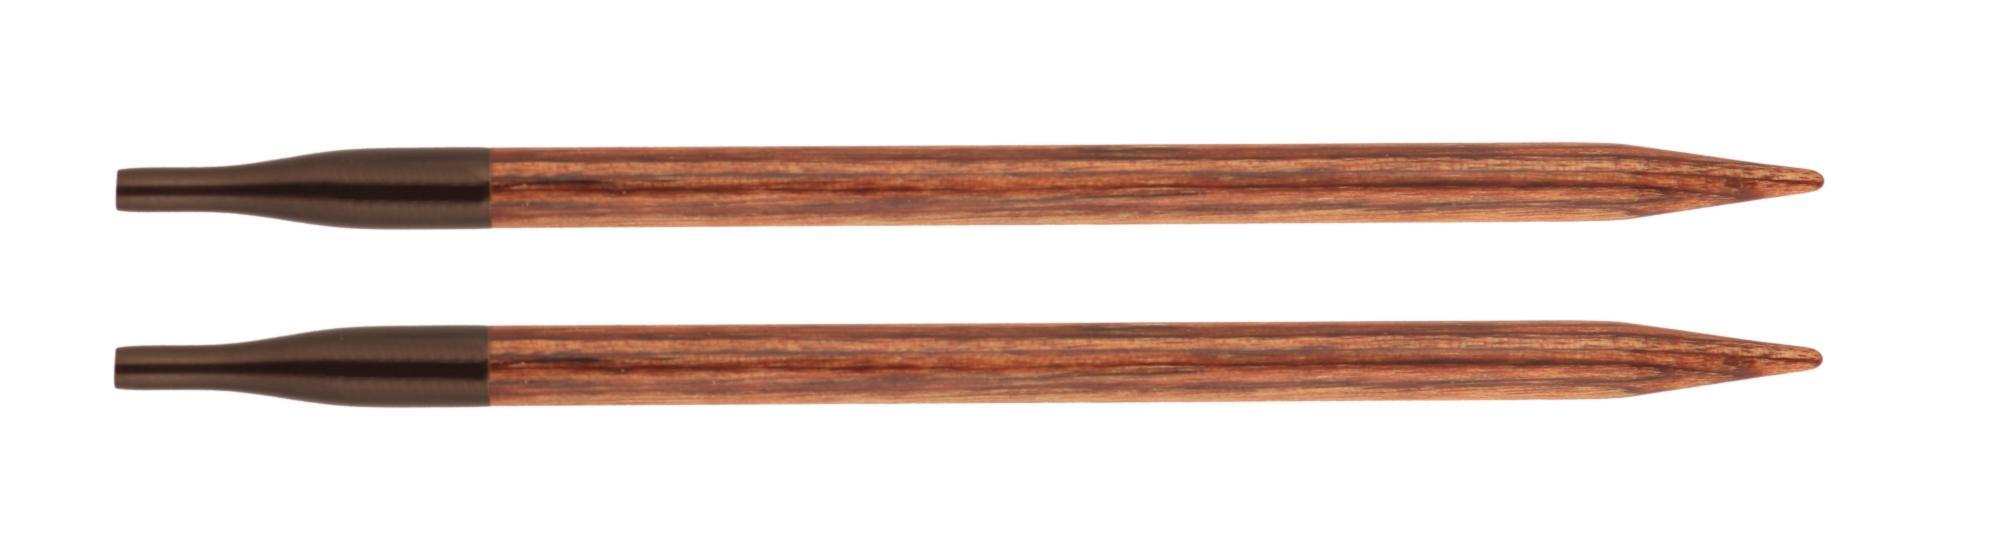 31209 Спицы съемные 6.00 мм Ginger KnitPro